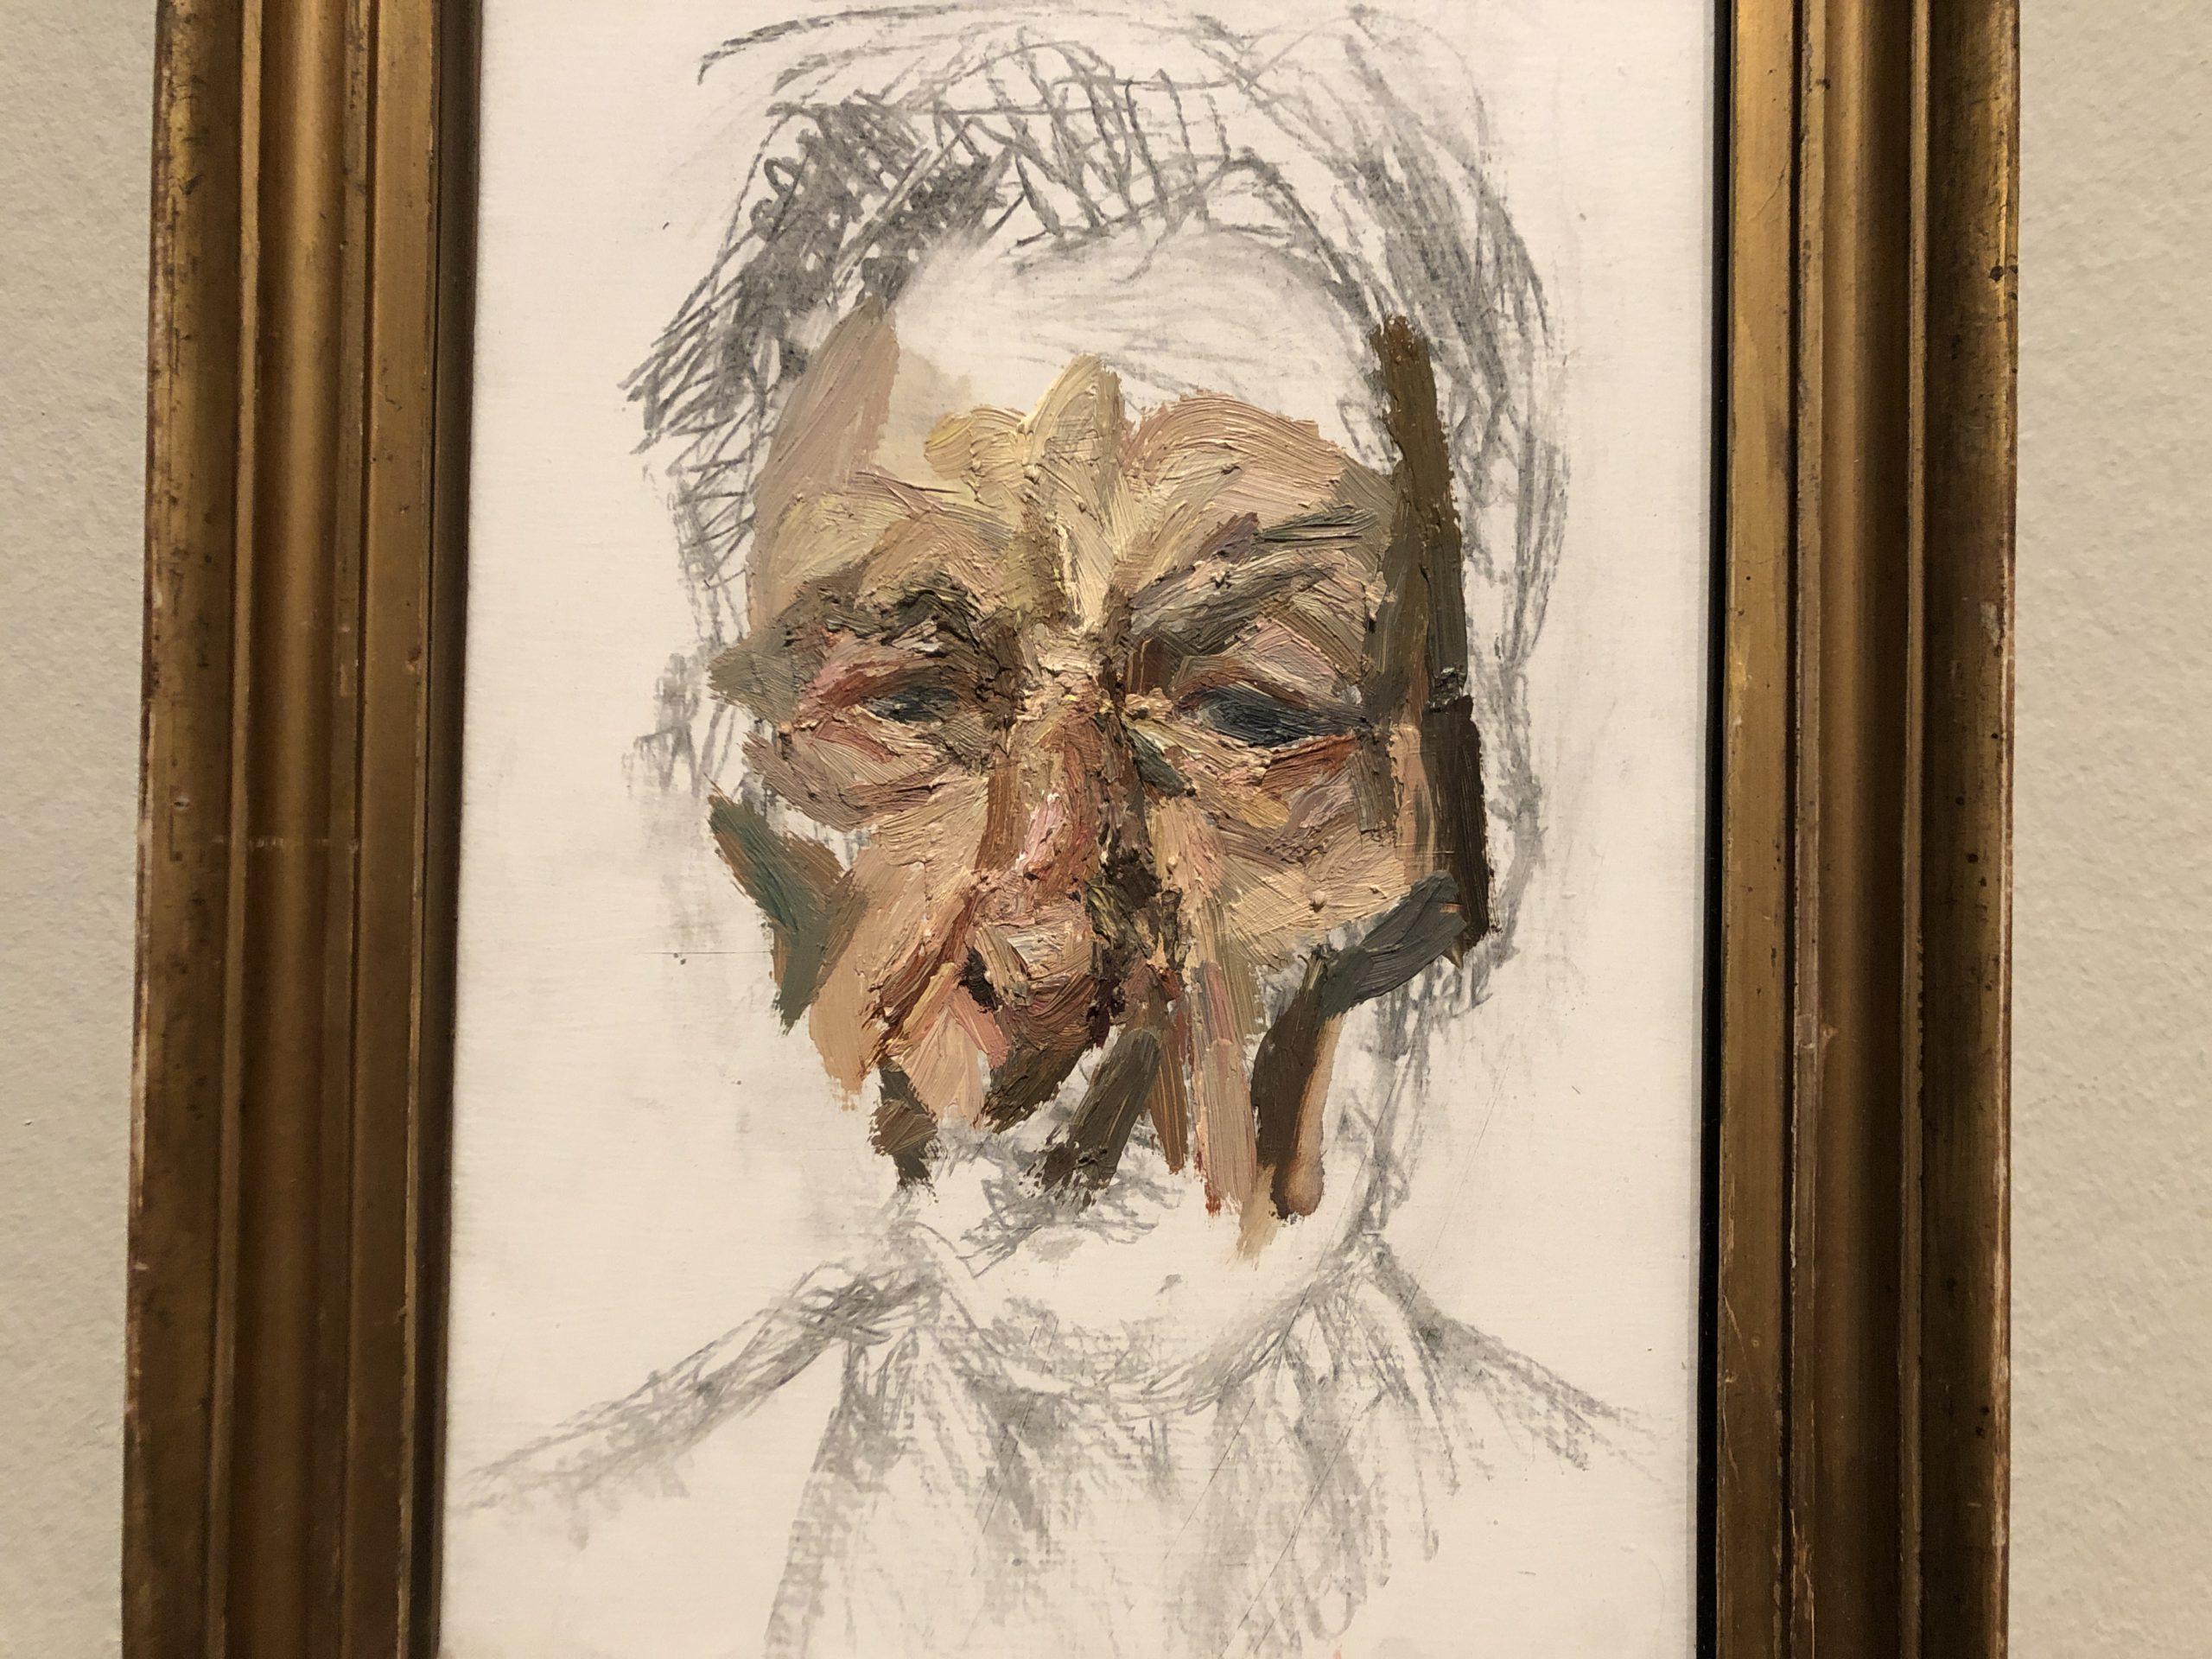 Image of artwork titled Self-portrait by artist Lucian Freud